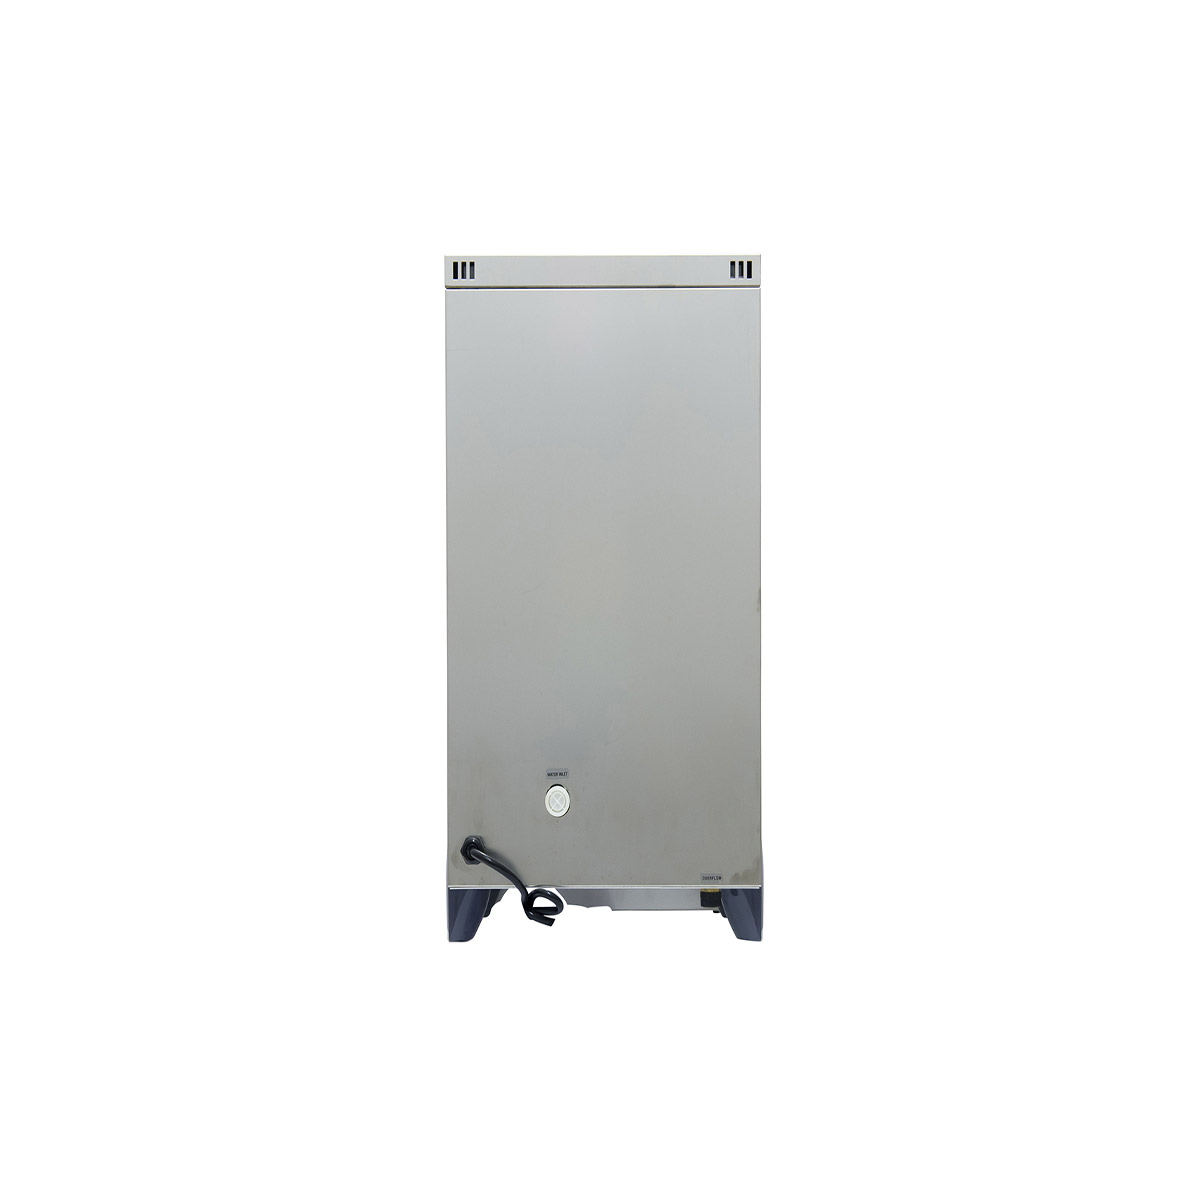 Instanta Sureflow Plus Counter Top Water Boiler CTSP19T/6 Twin Taps Filtered 19Ltr